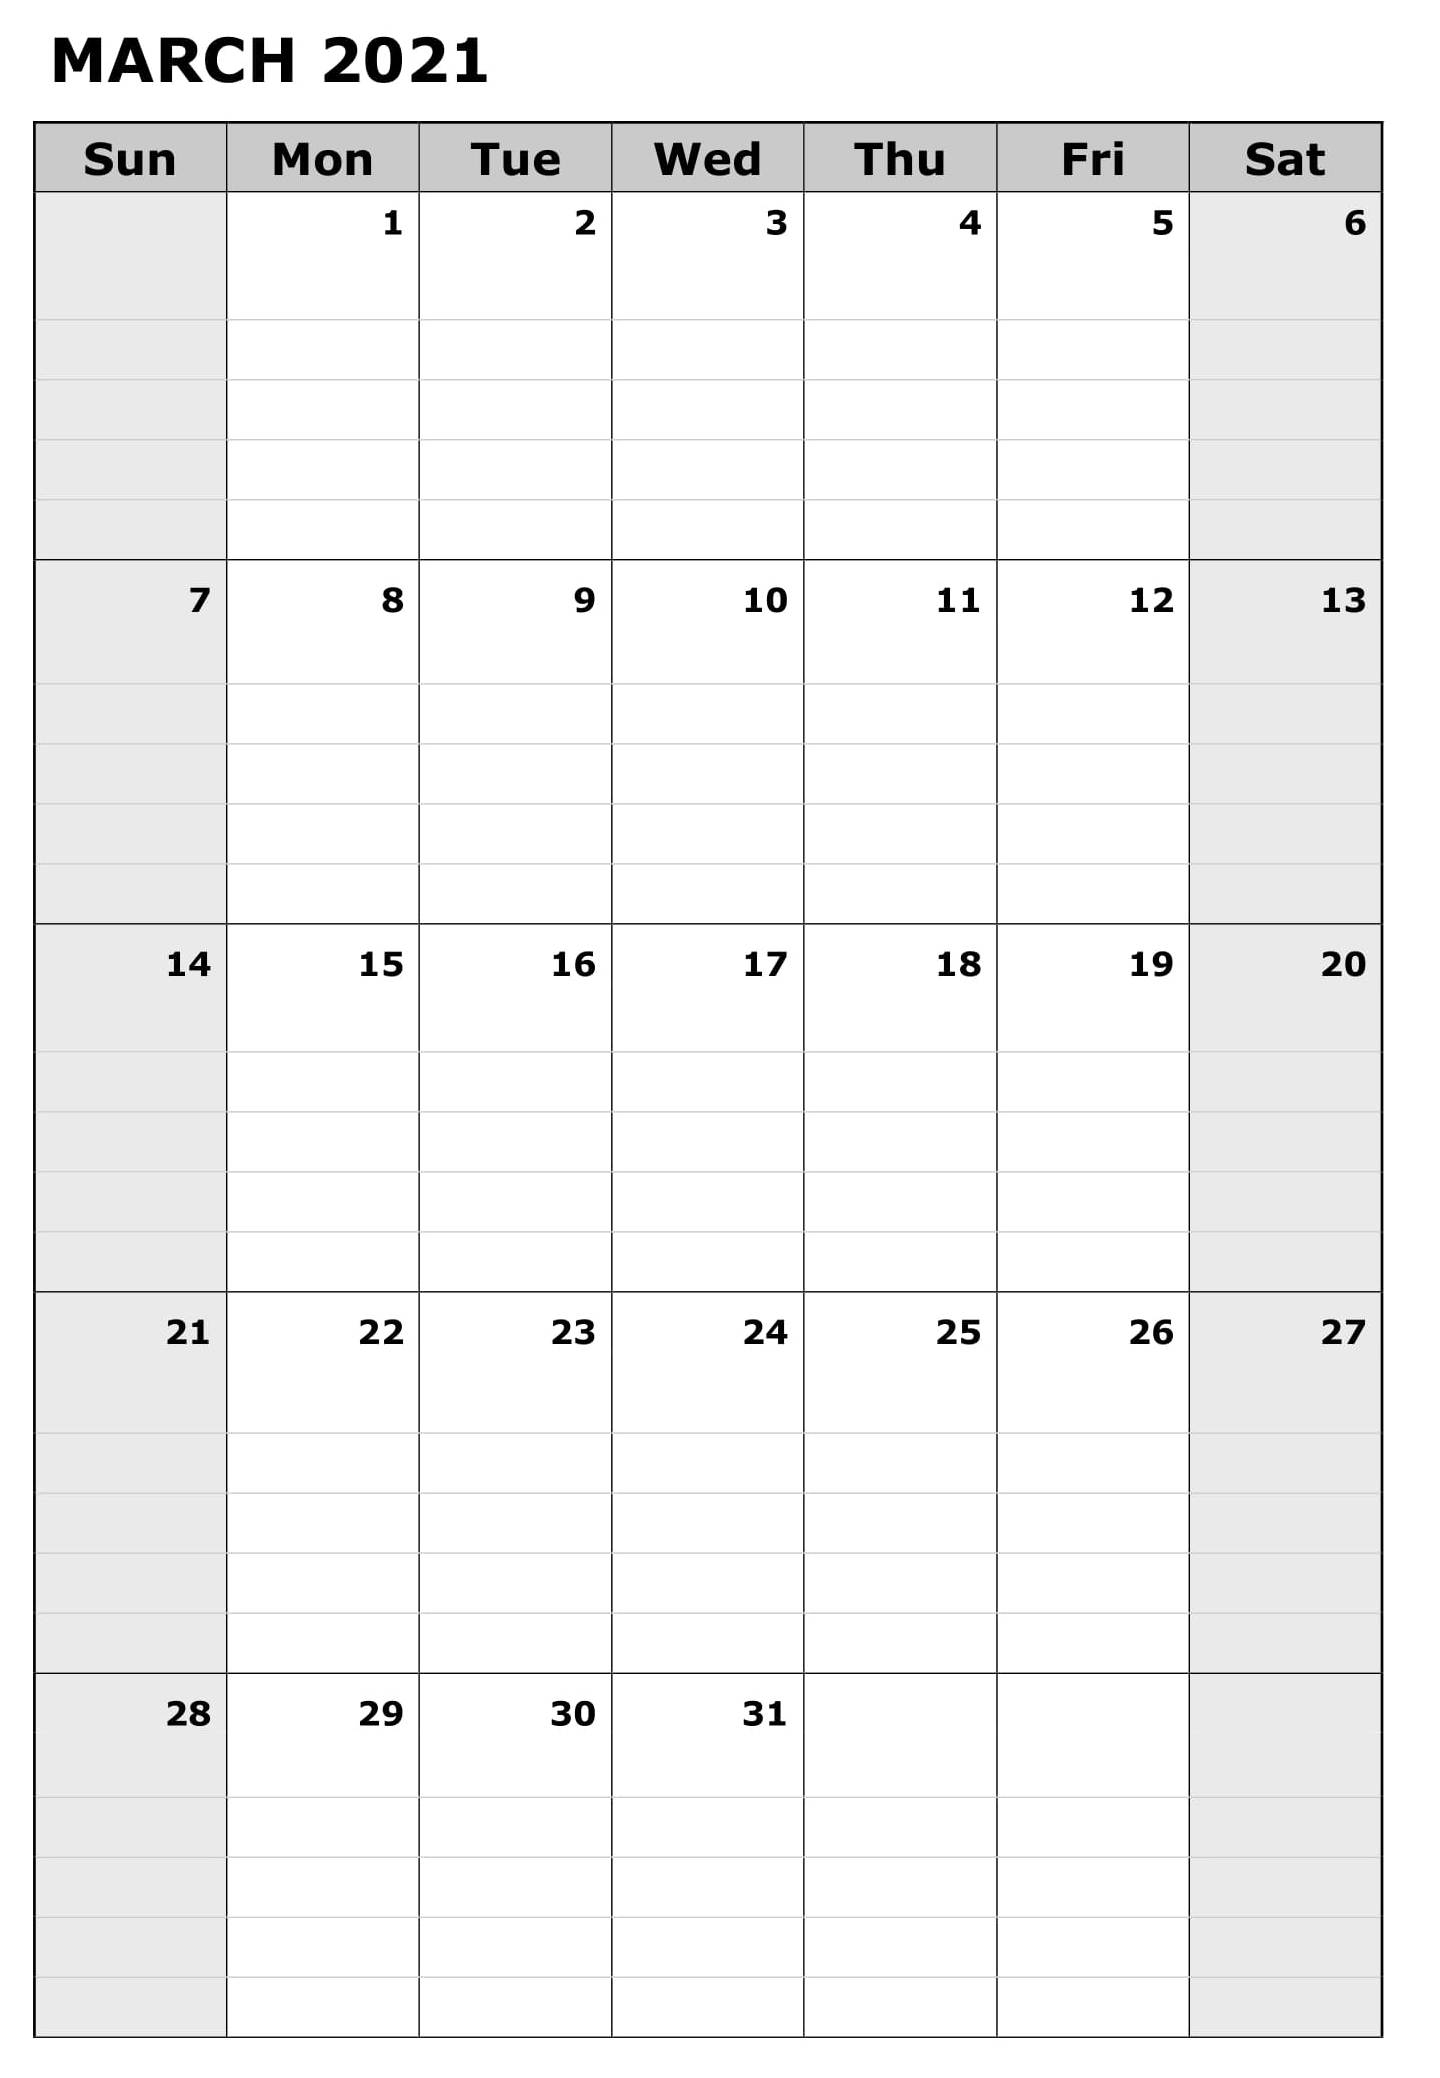 Print March 2021 Calendar Template Word – Printable Office Inside March 2021 Calendar Template